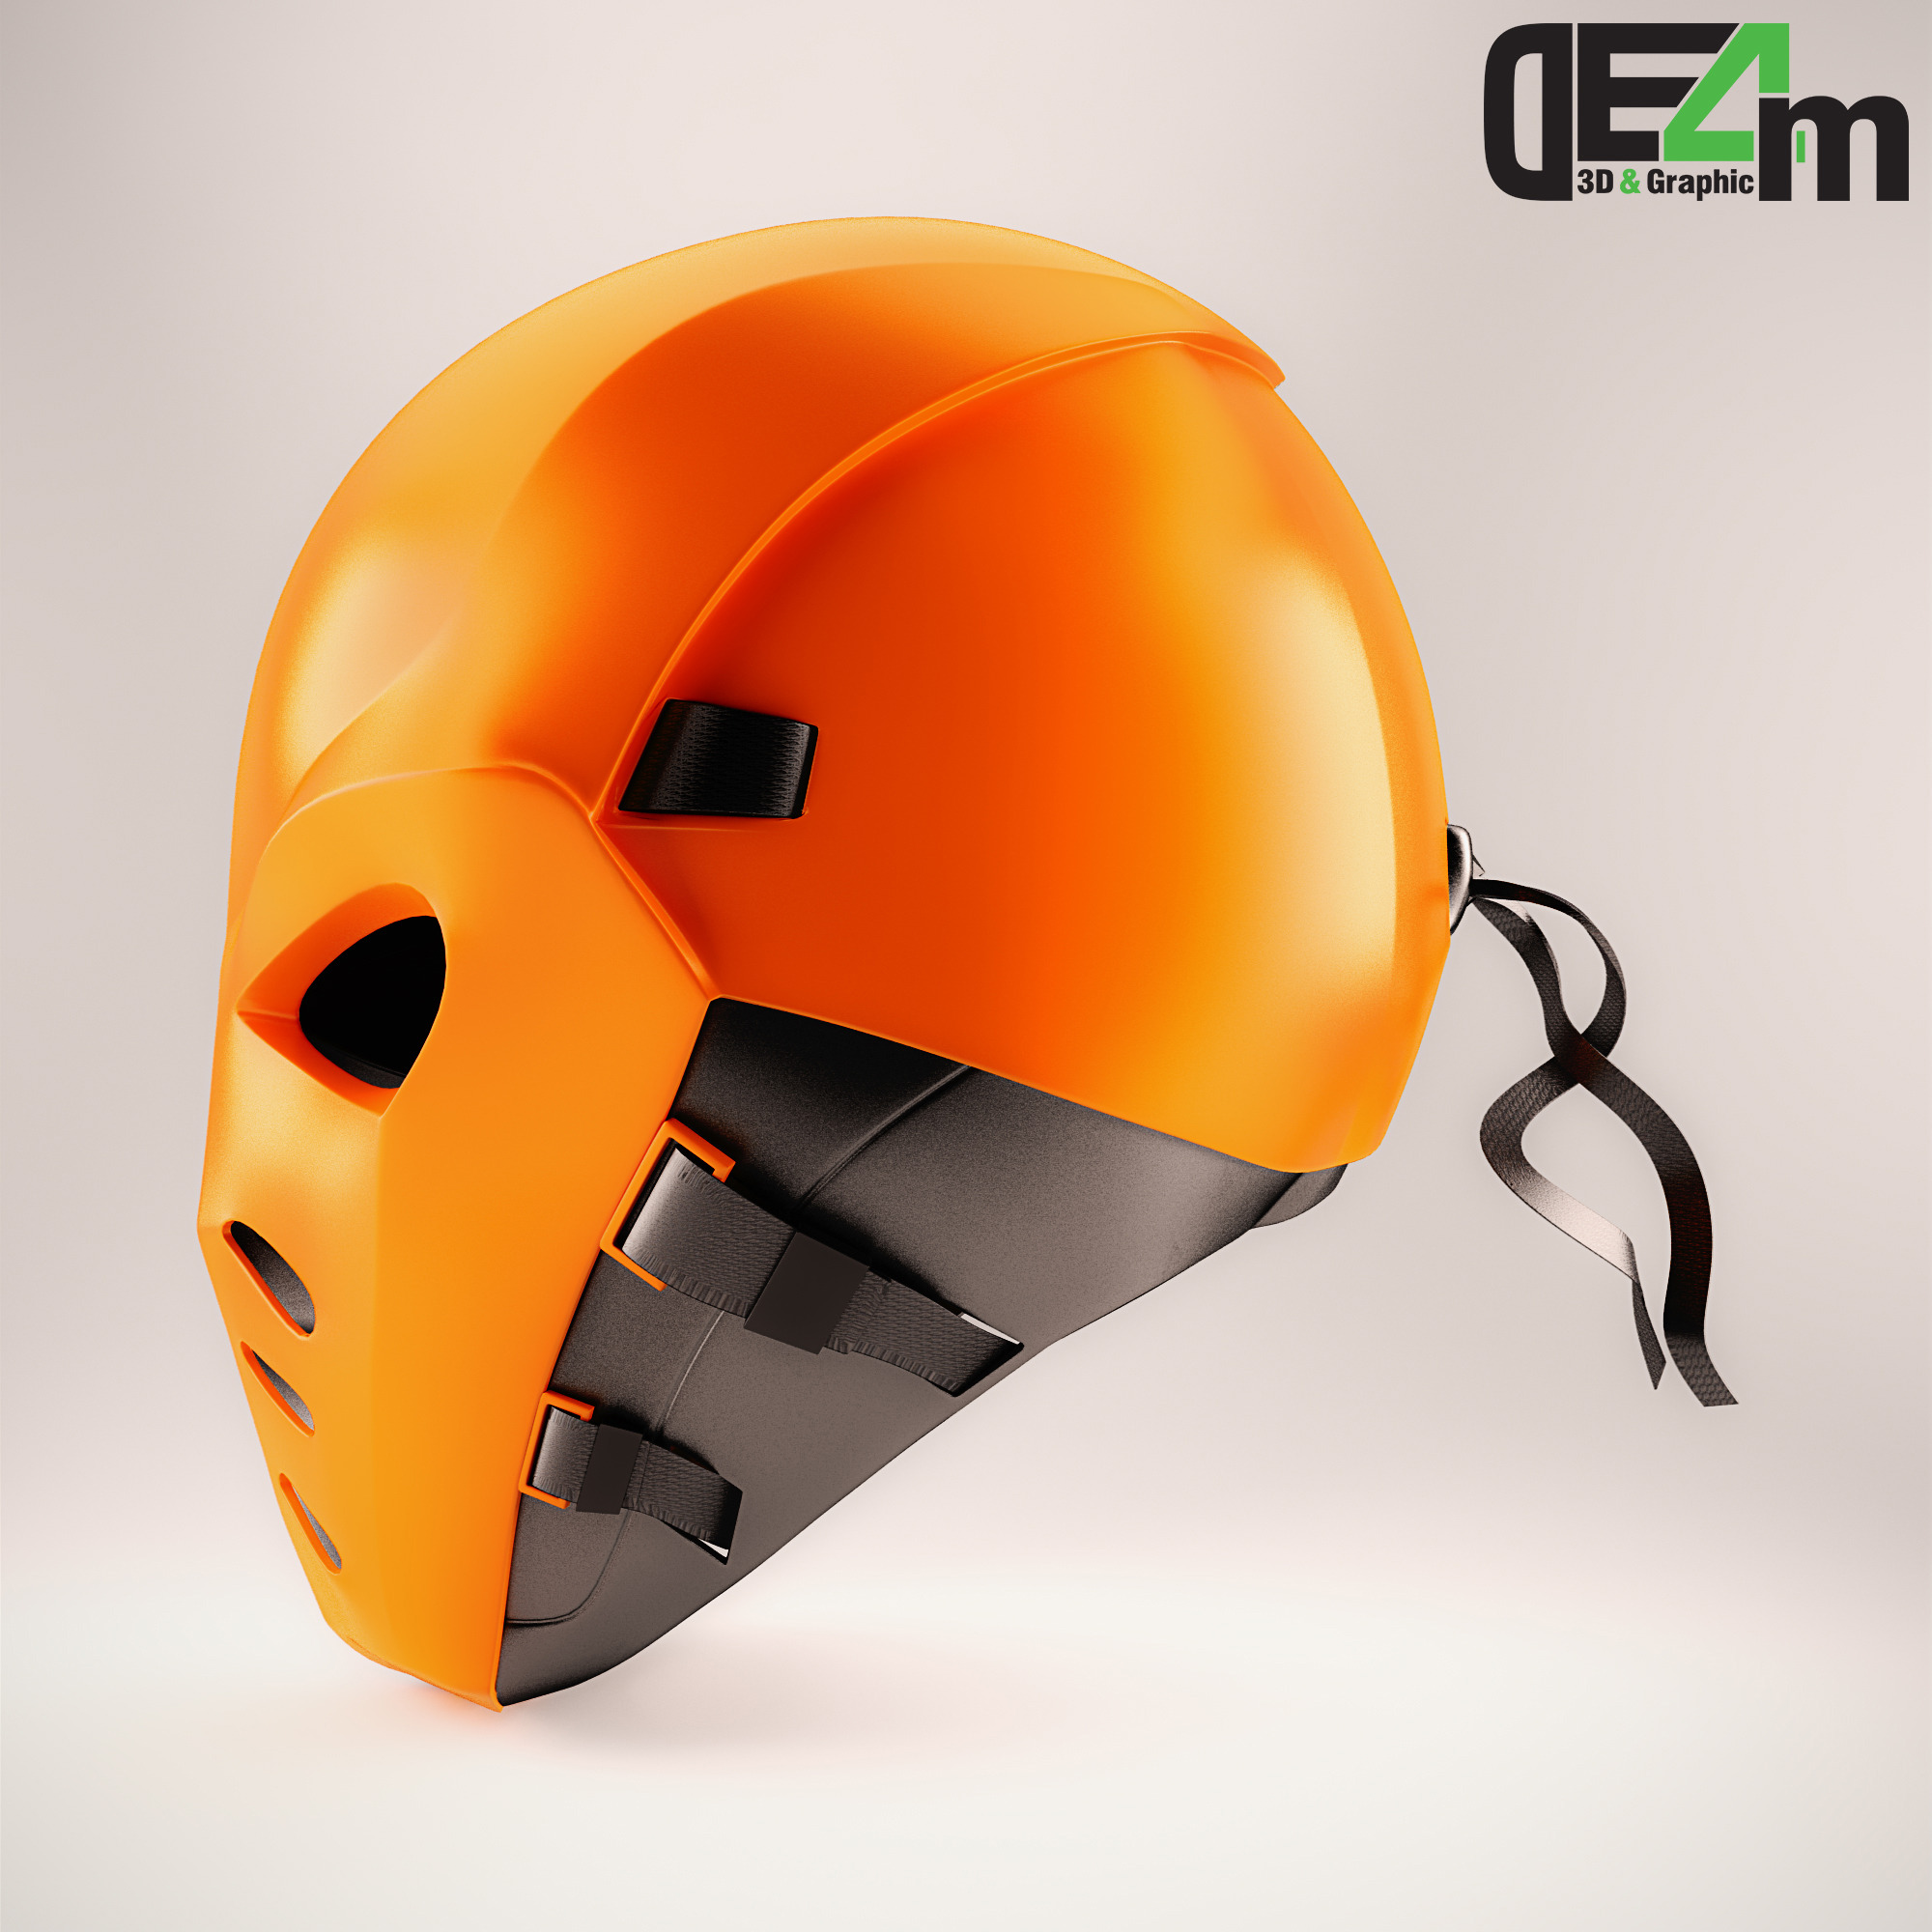 Deathstroke Helmet By De4m 3docean